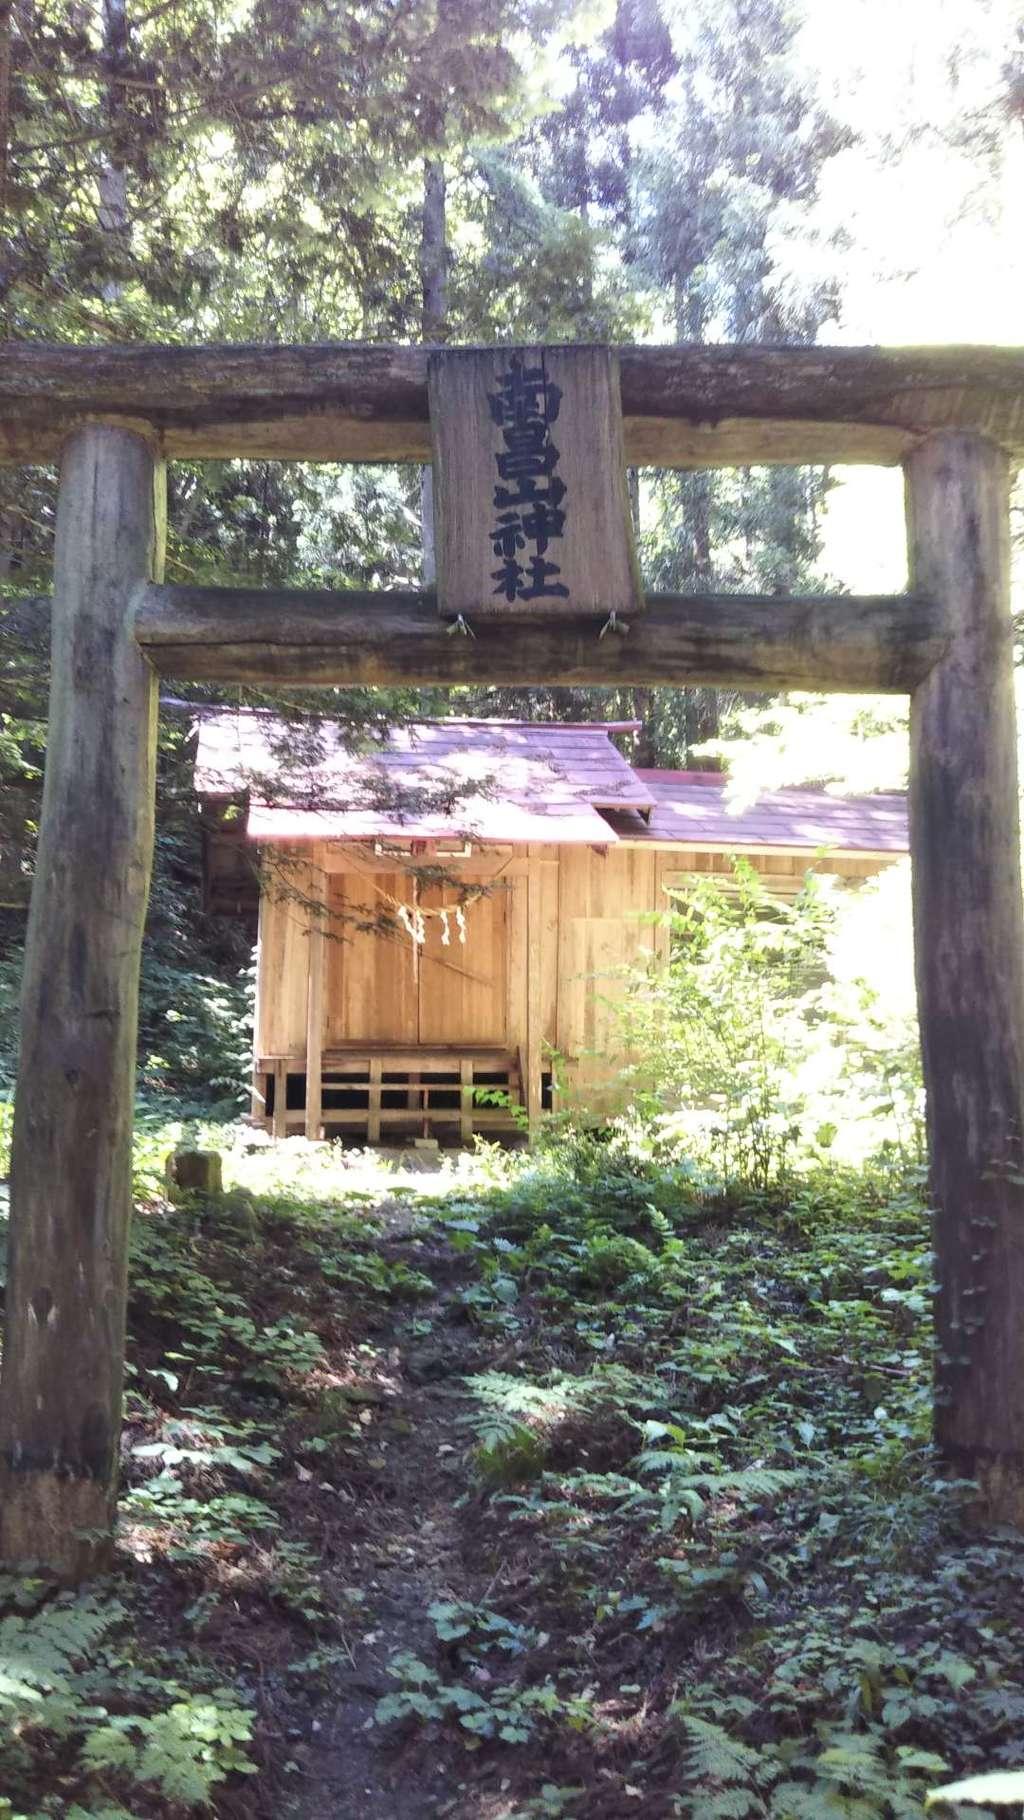 南昌山神社の鳥居